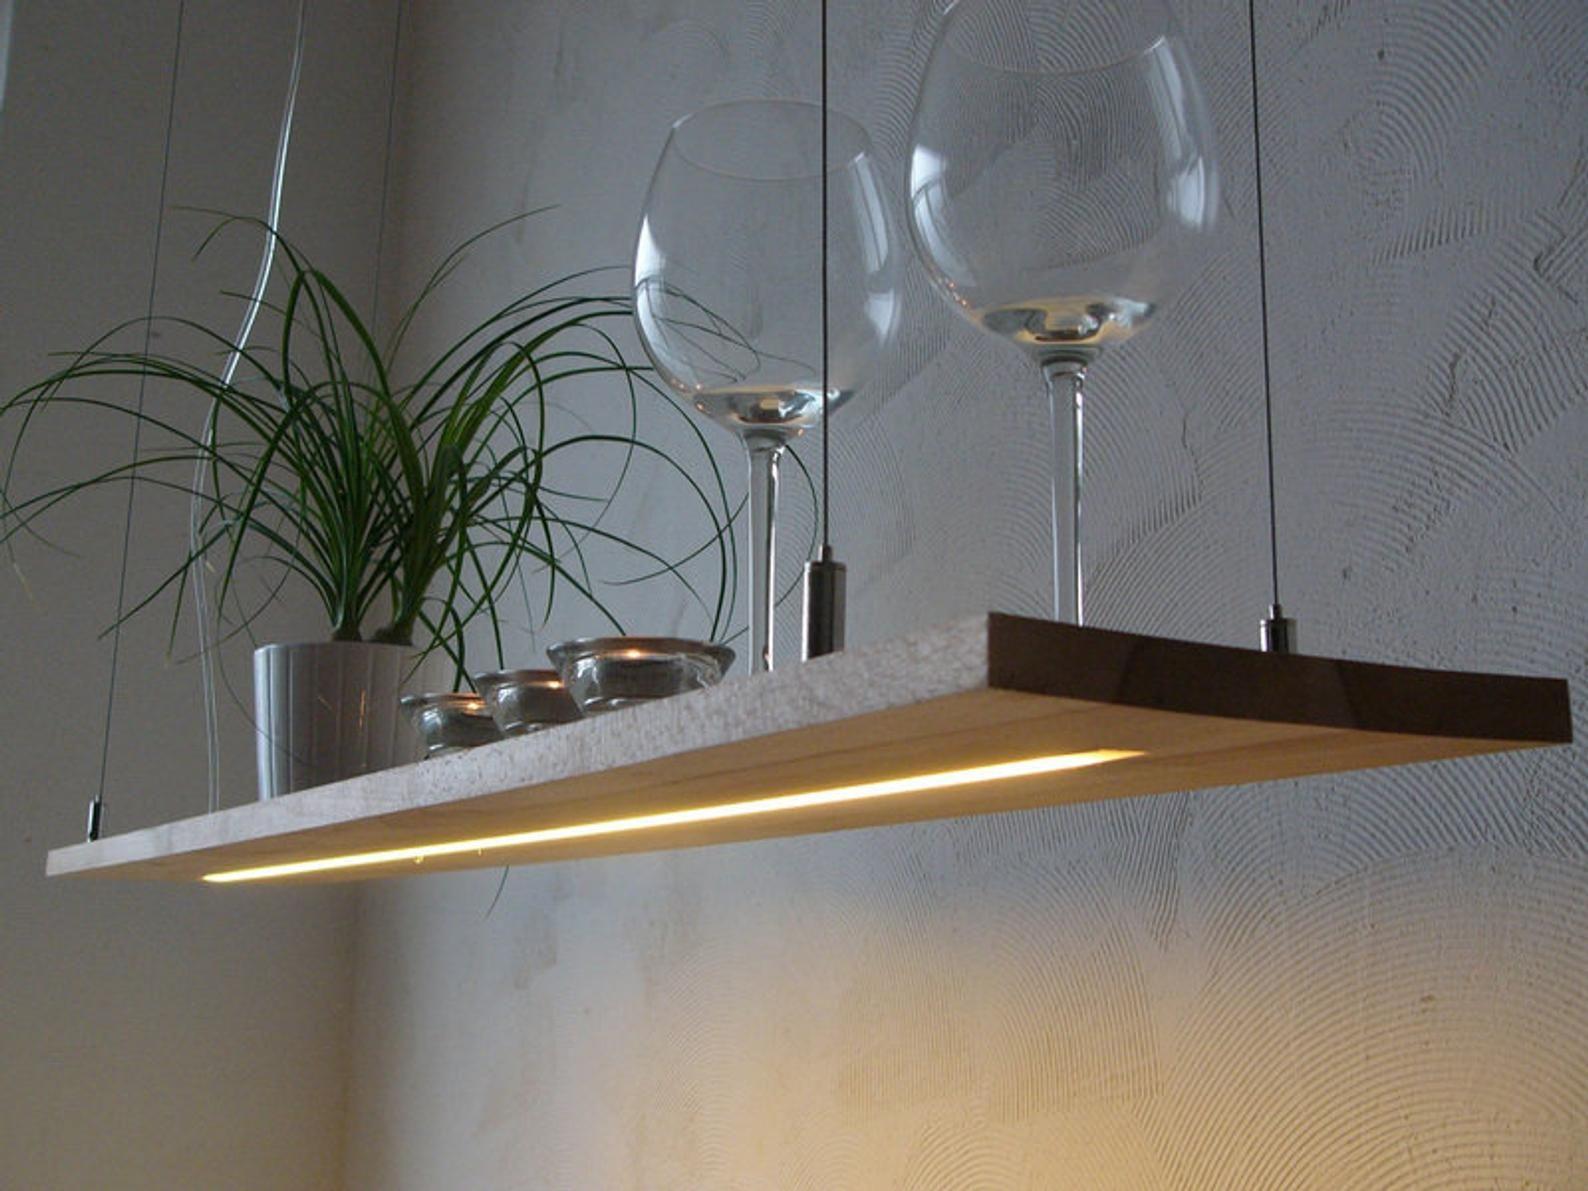 Hanging Lamp Beech Shelf Lamp Led Light Hangende Lampen Houten Lamp Lampen Woonkamer